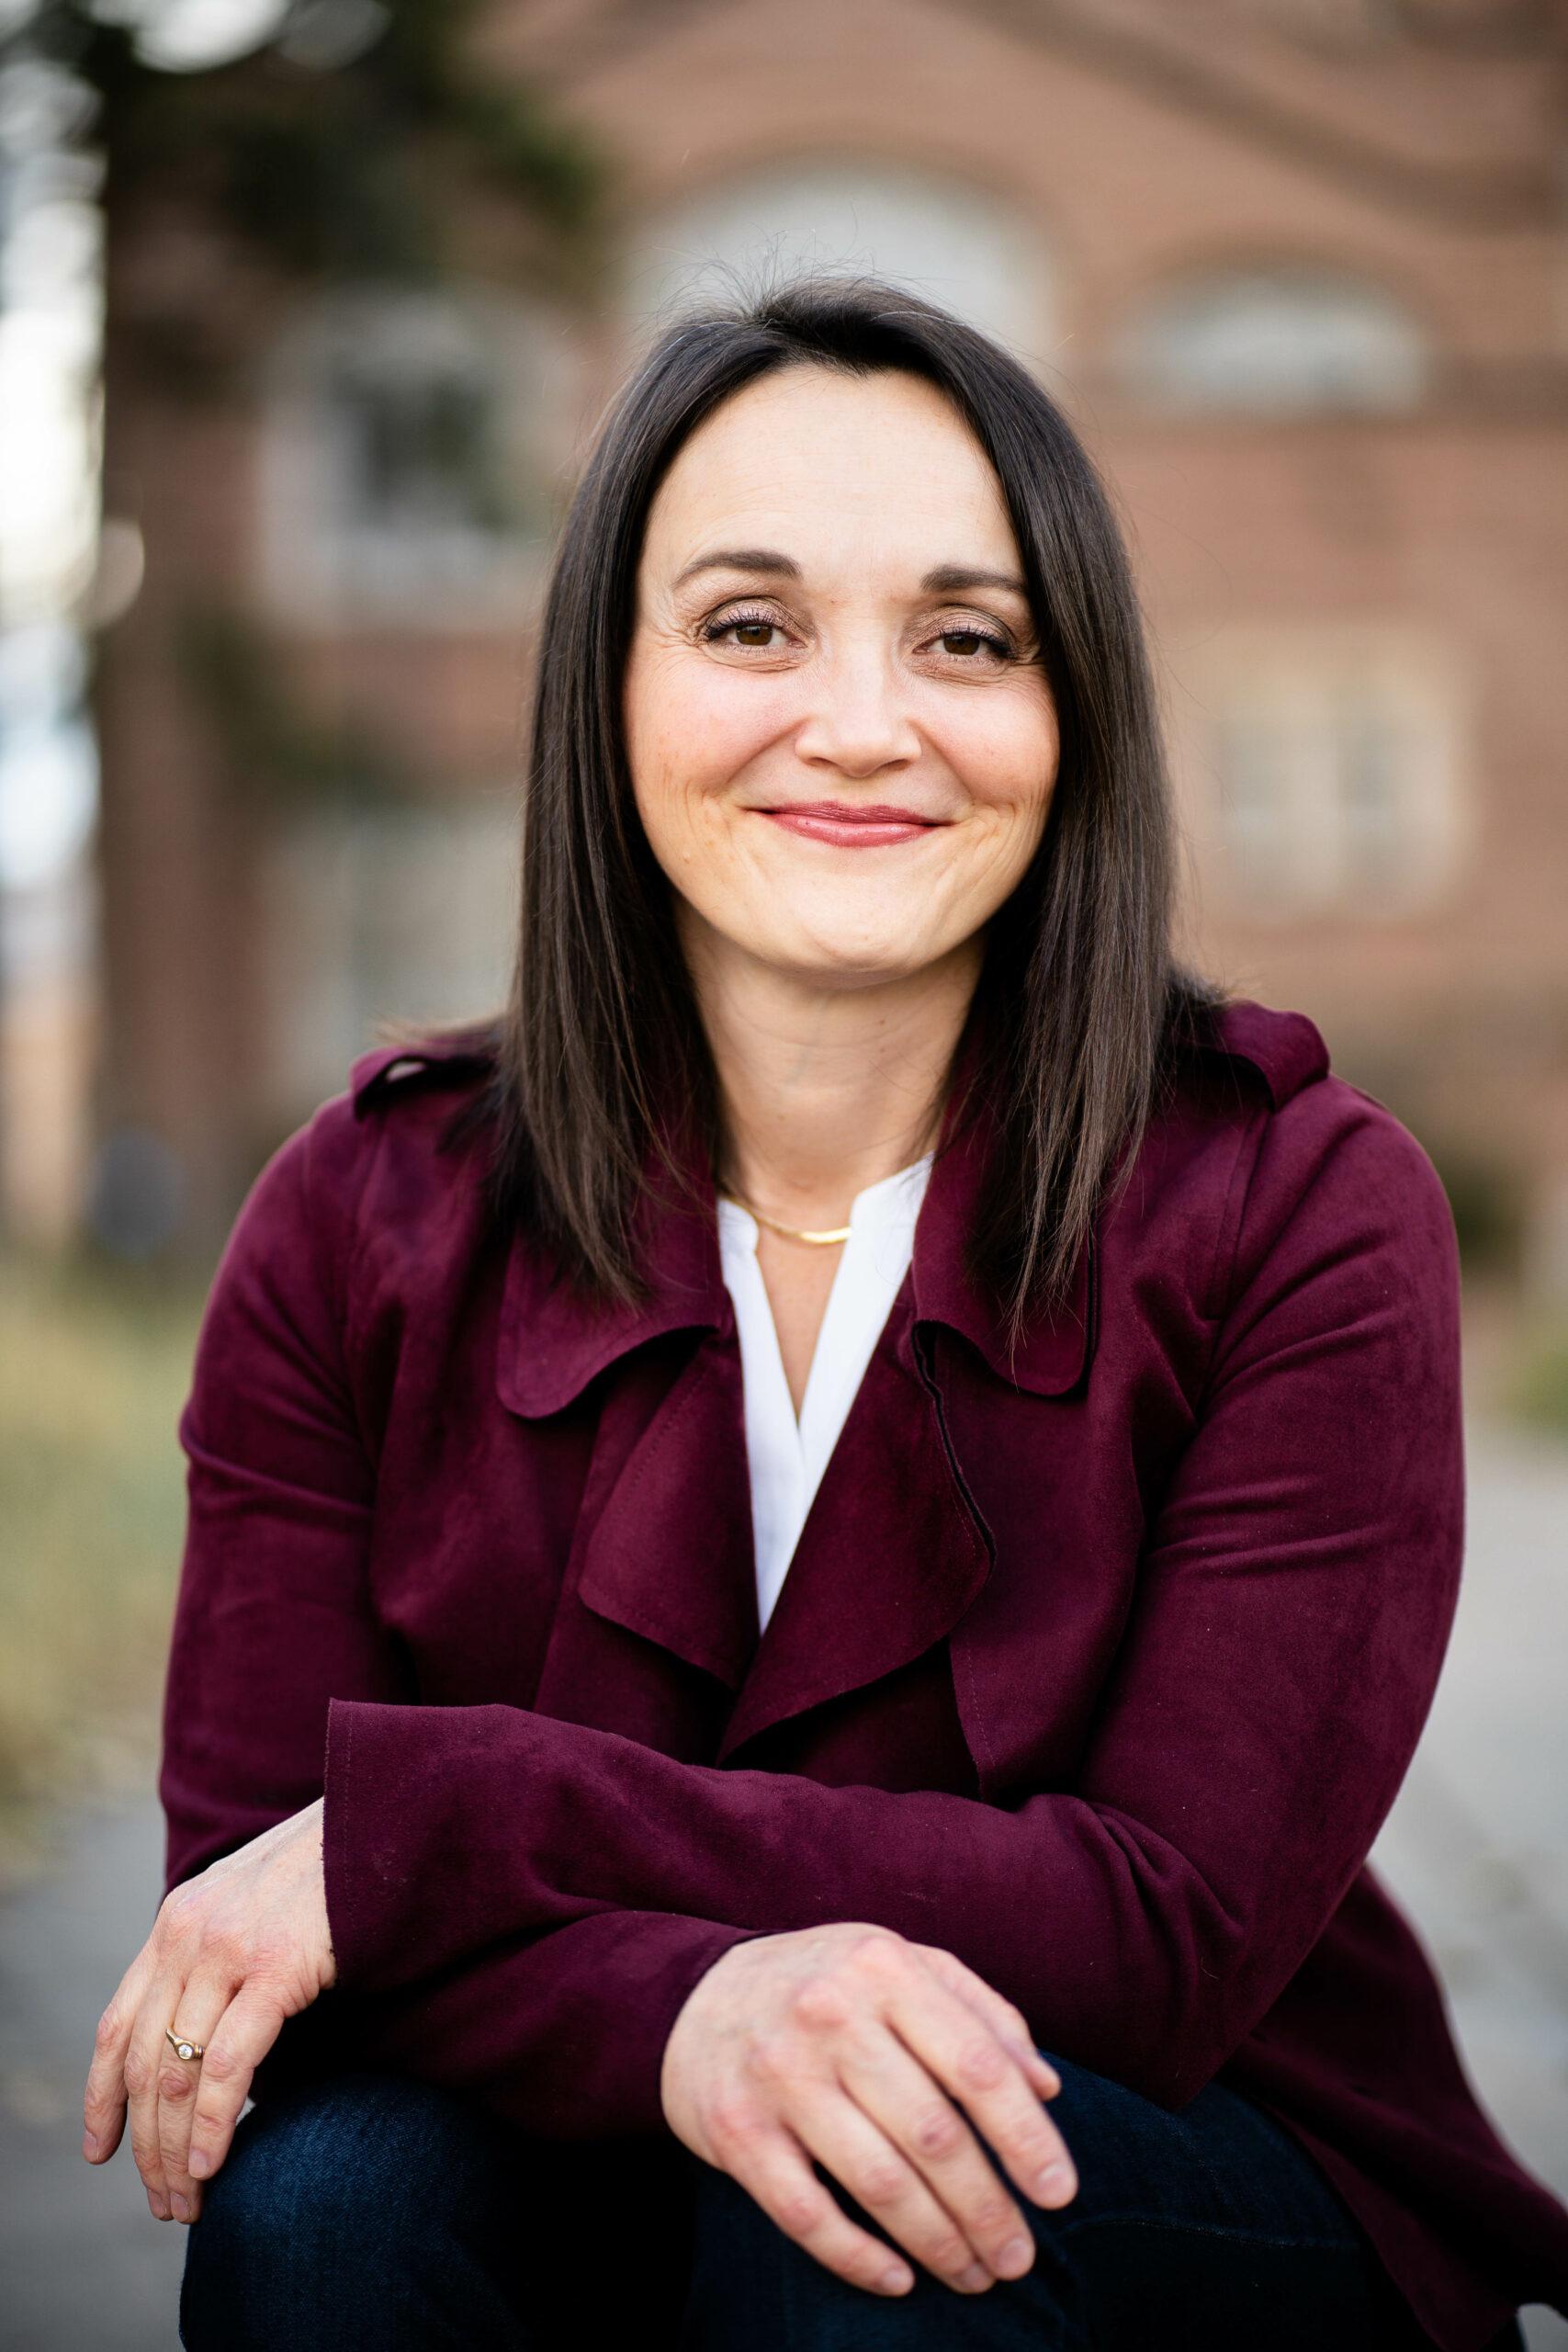 Dr. Nicole Speer: Let equity drive Boulder's decision-making